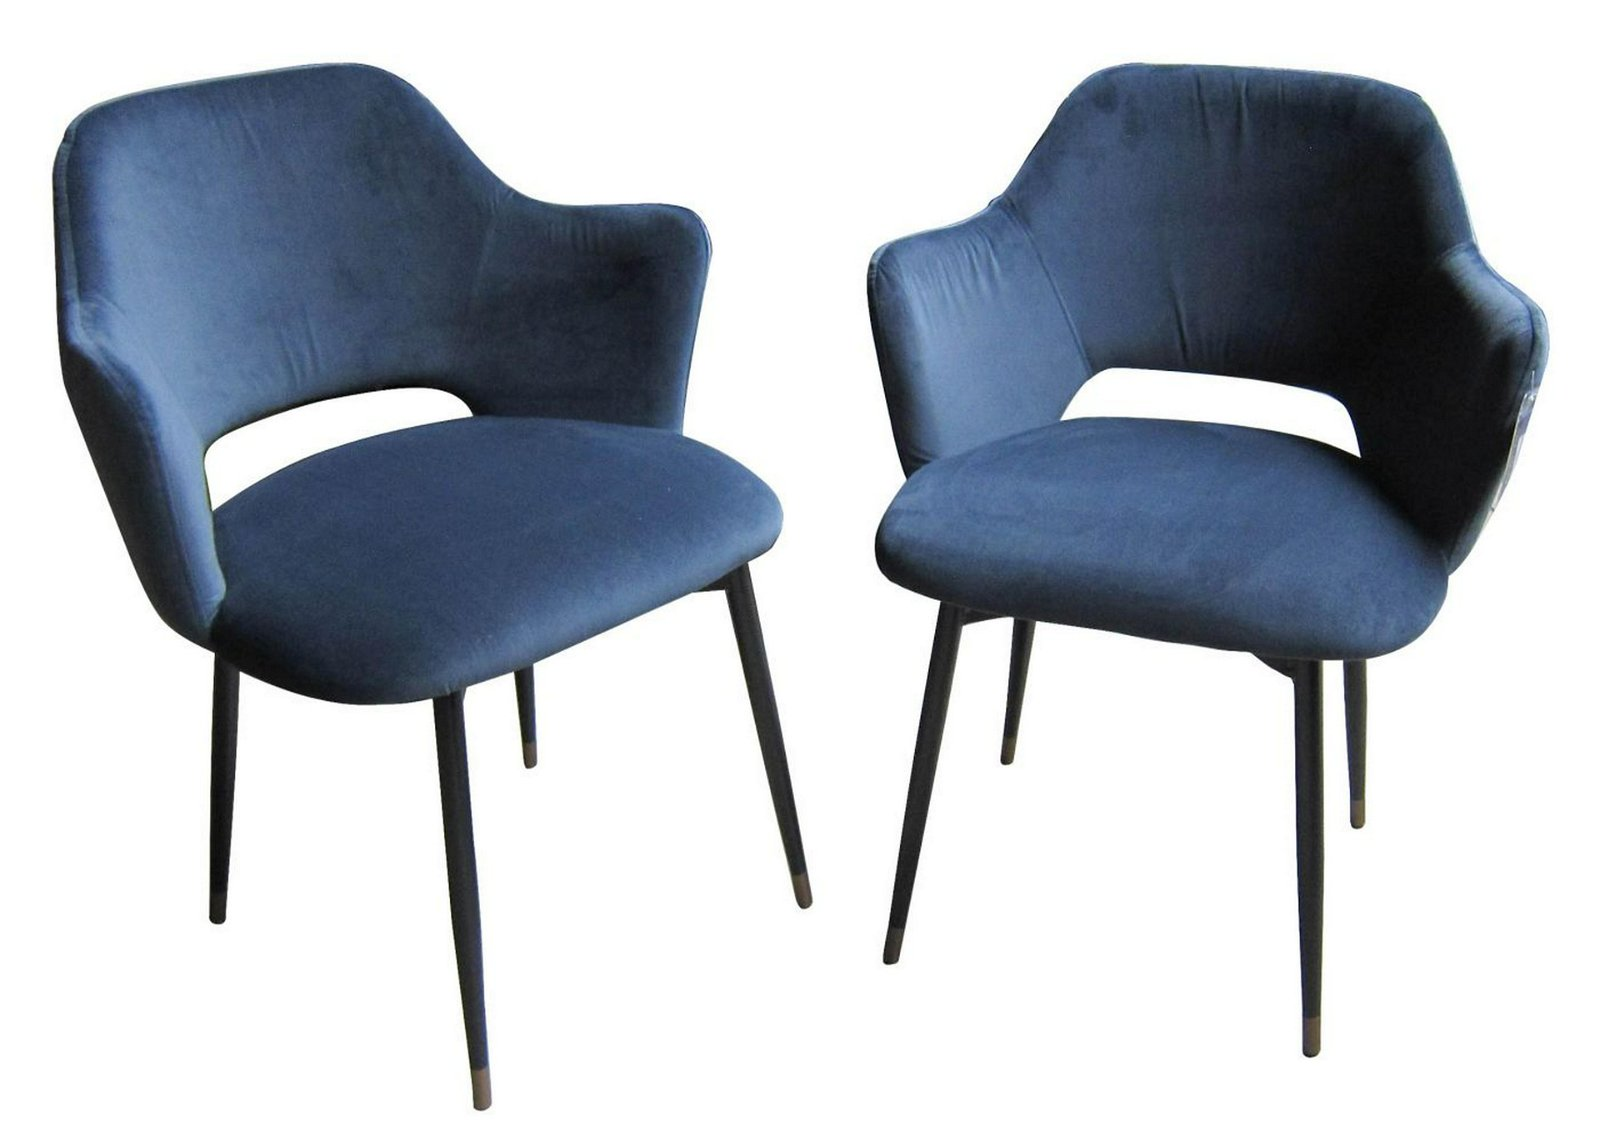 Pair of European-design Modern armchairs